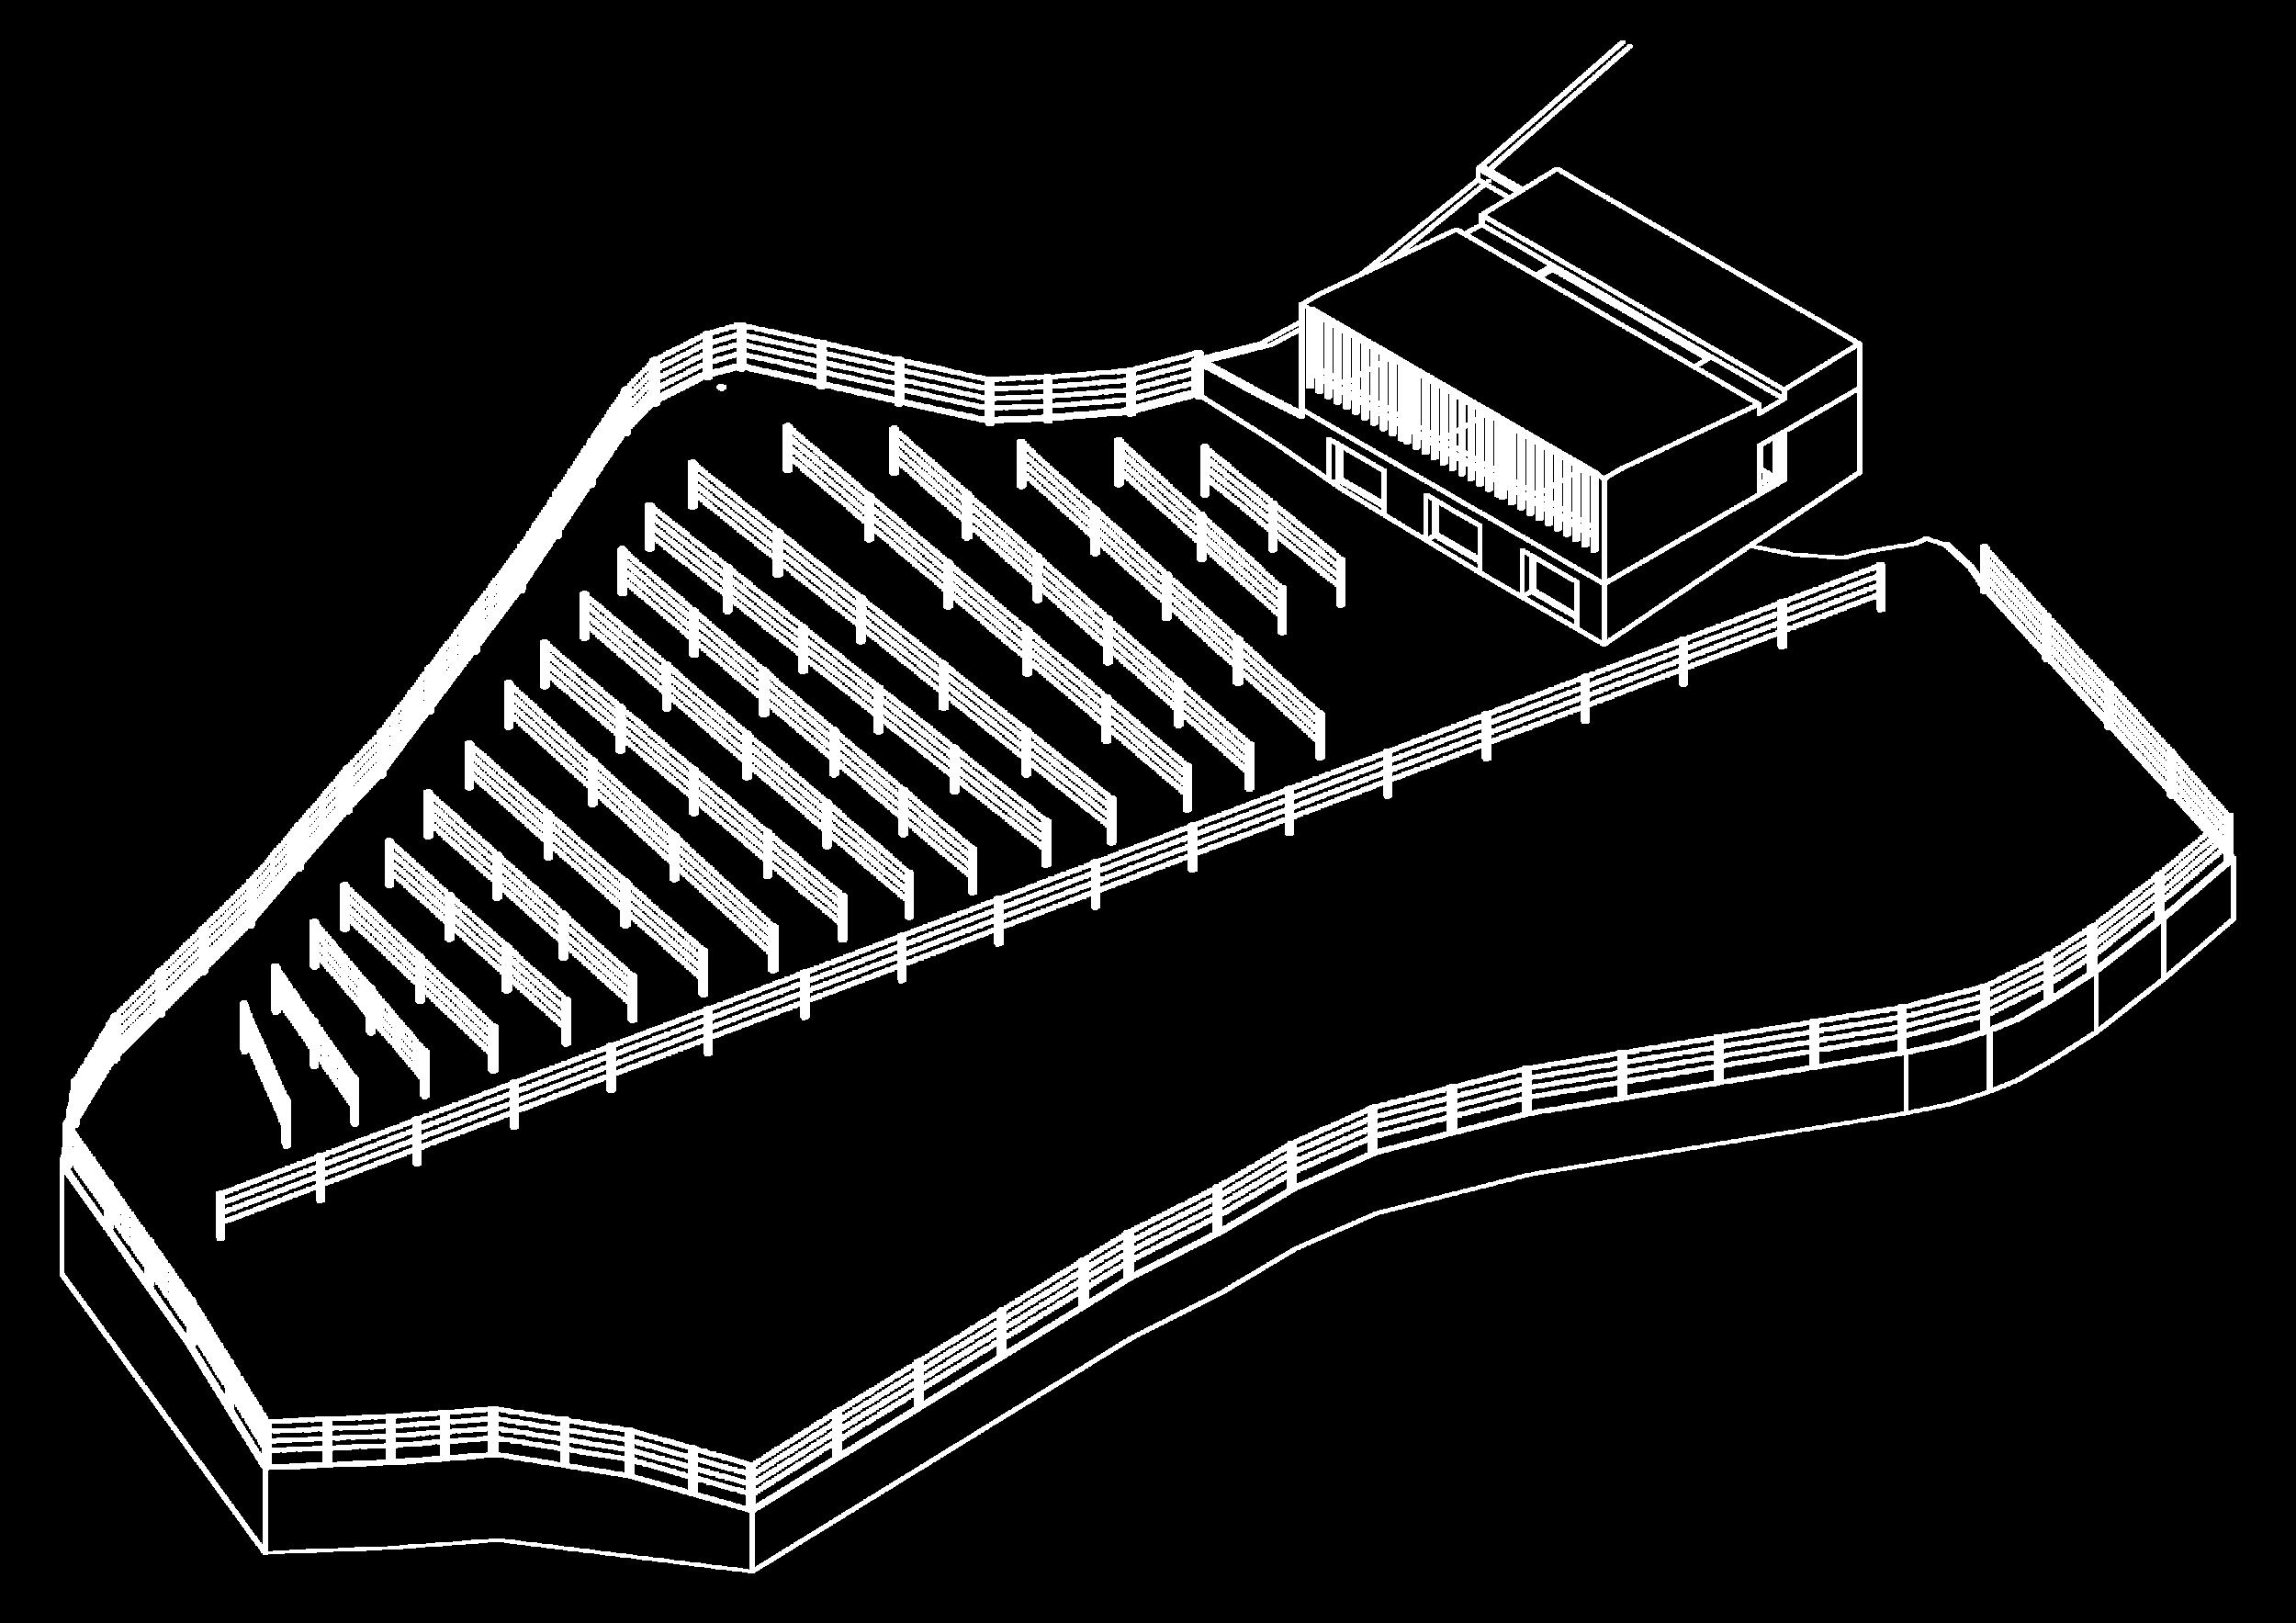 rhrc layout6-06.png